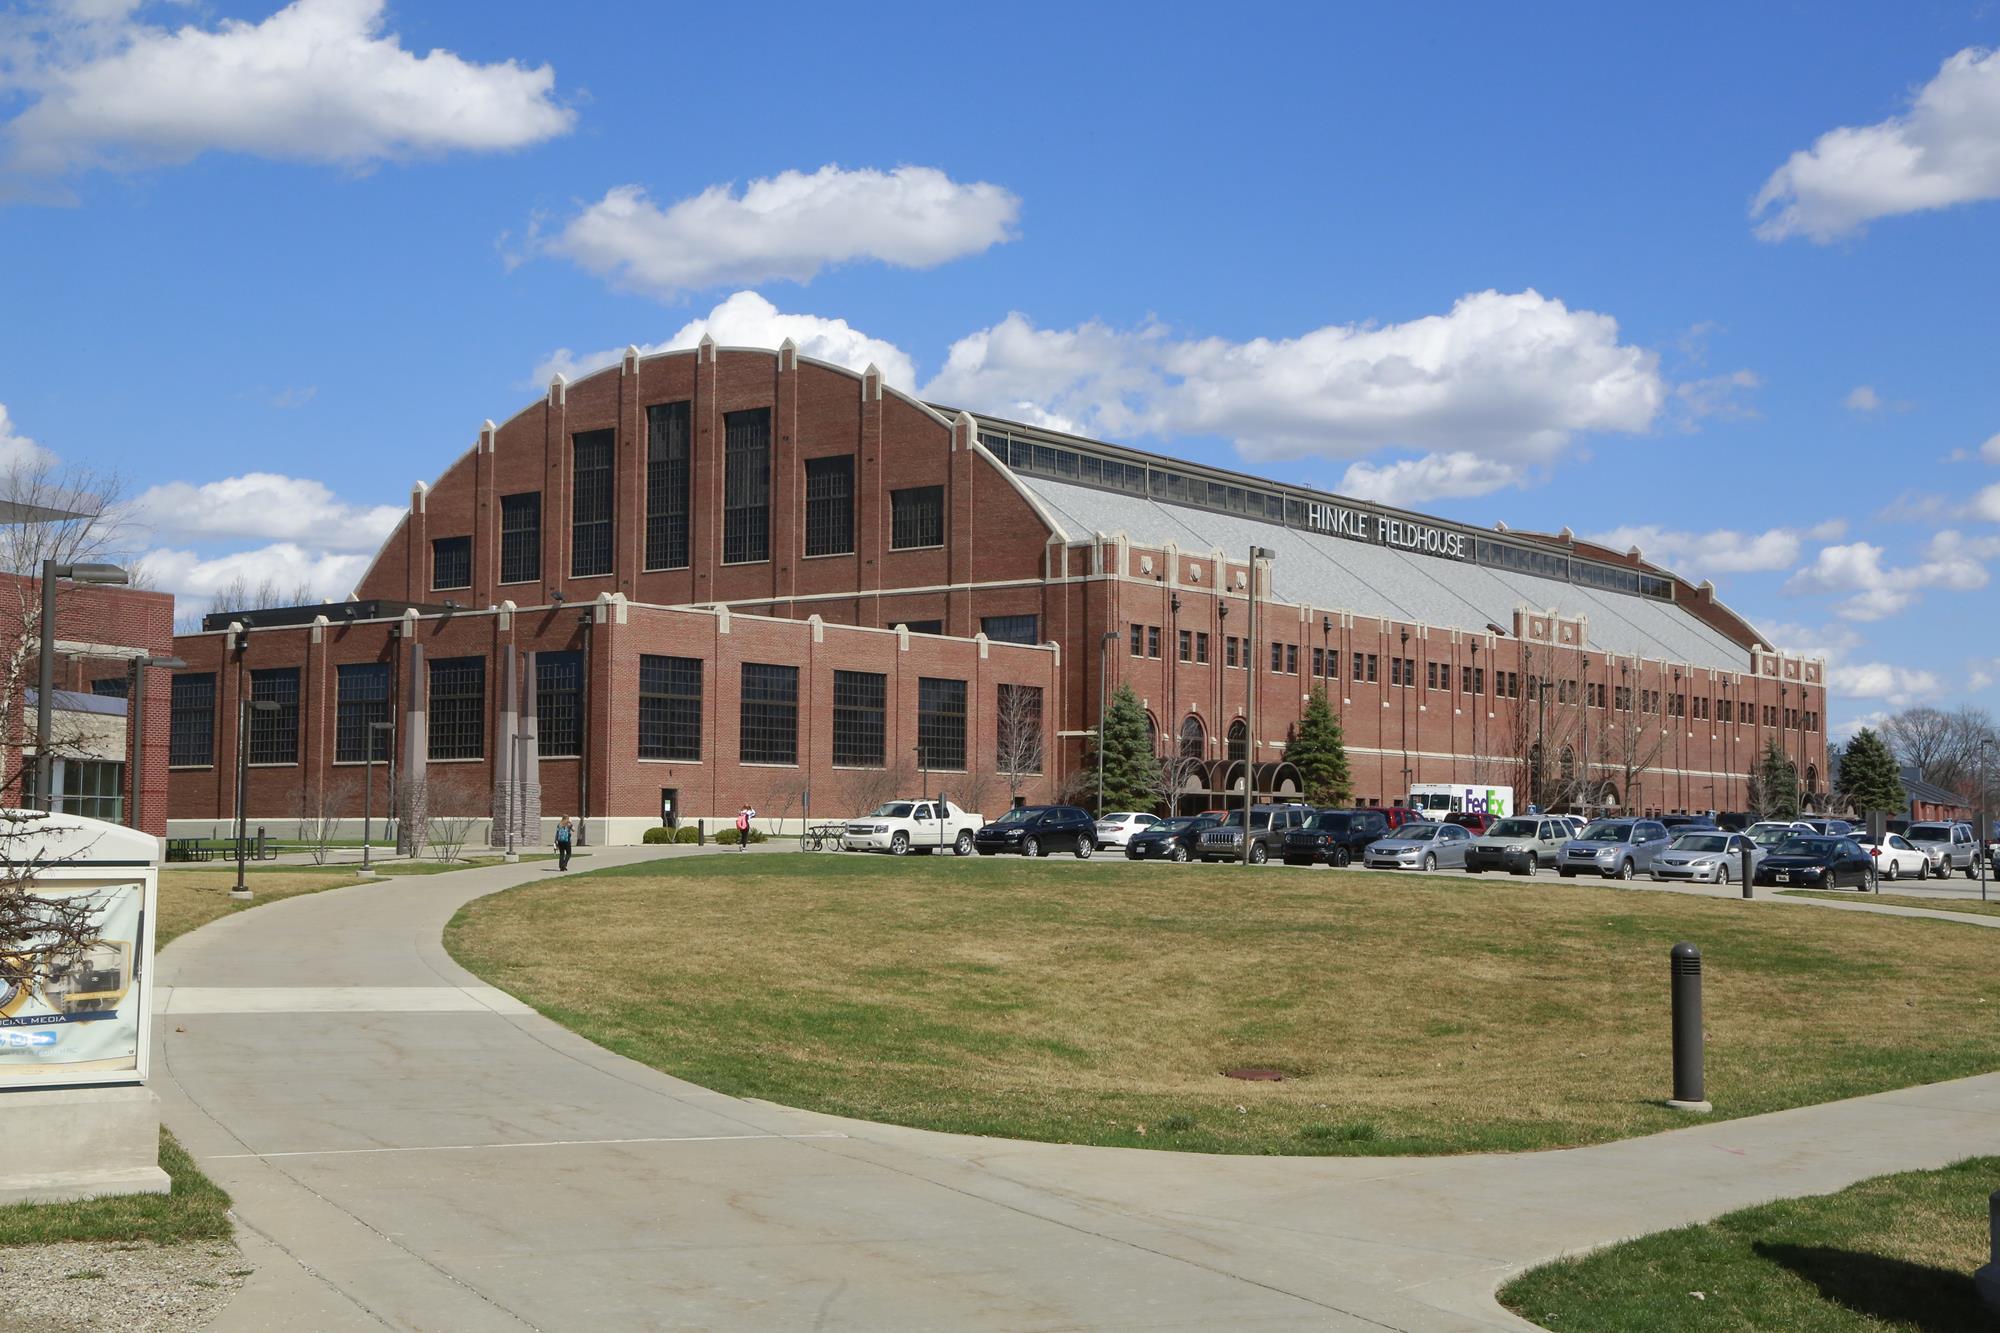 Virginia Tech, Hinkle Fieldhouse